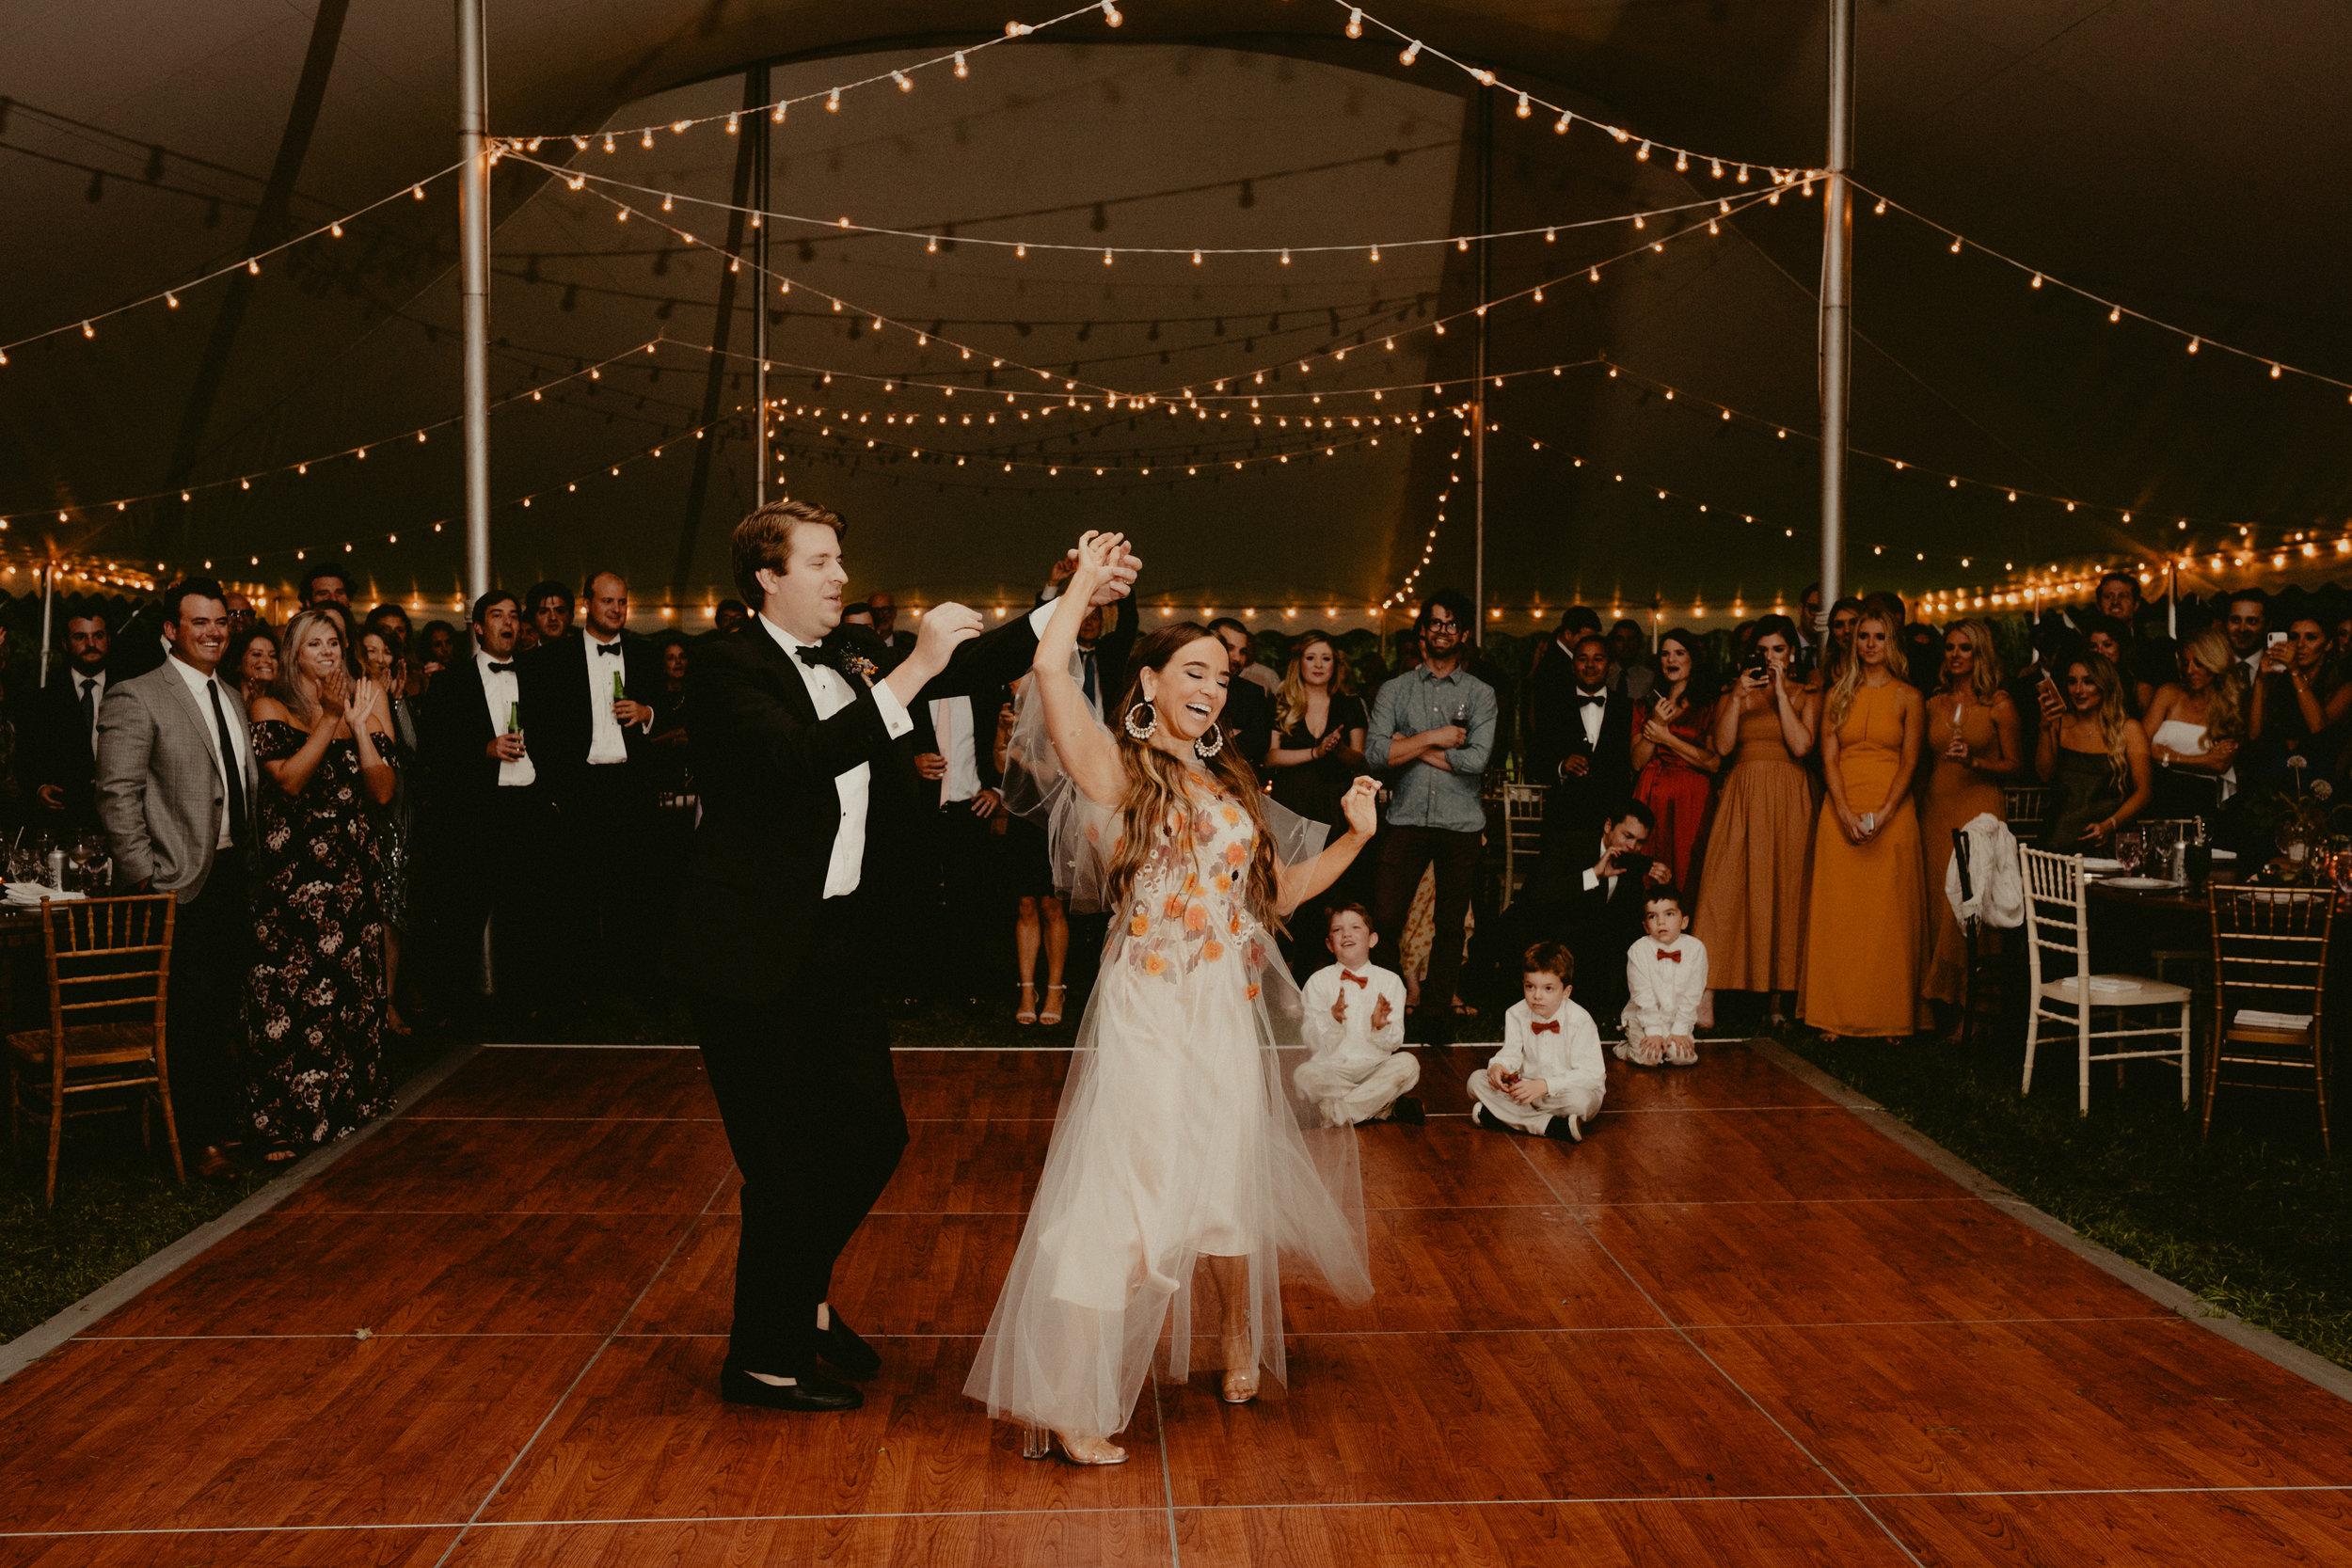 DEER_MOUNTAIN_INN_WEDDING_CHELLISE_MICHAEL_PHOTOGRAPHY-1510.jpg